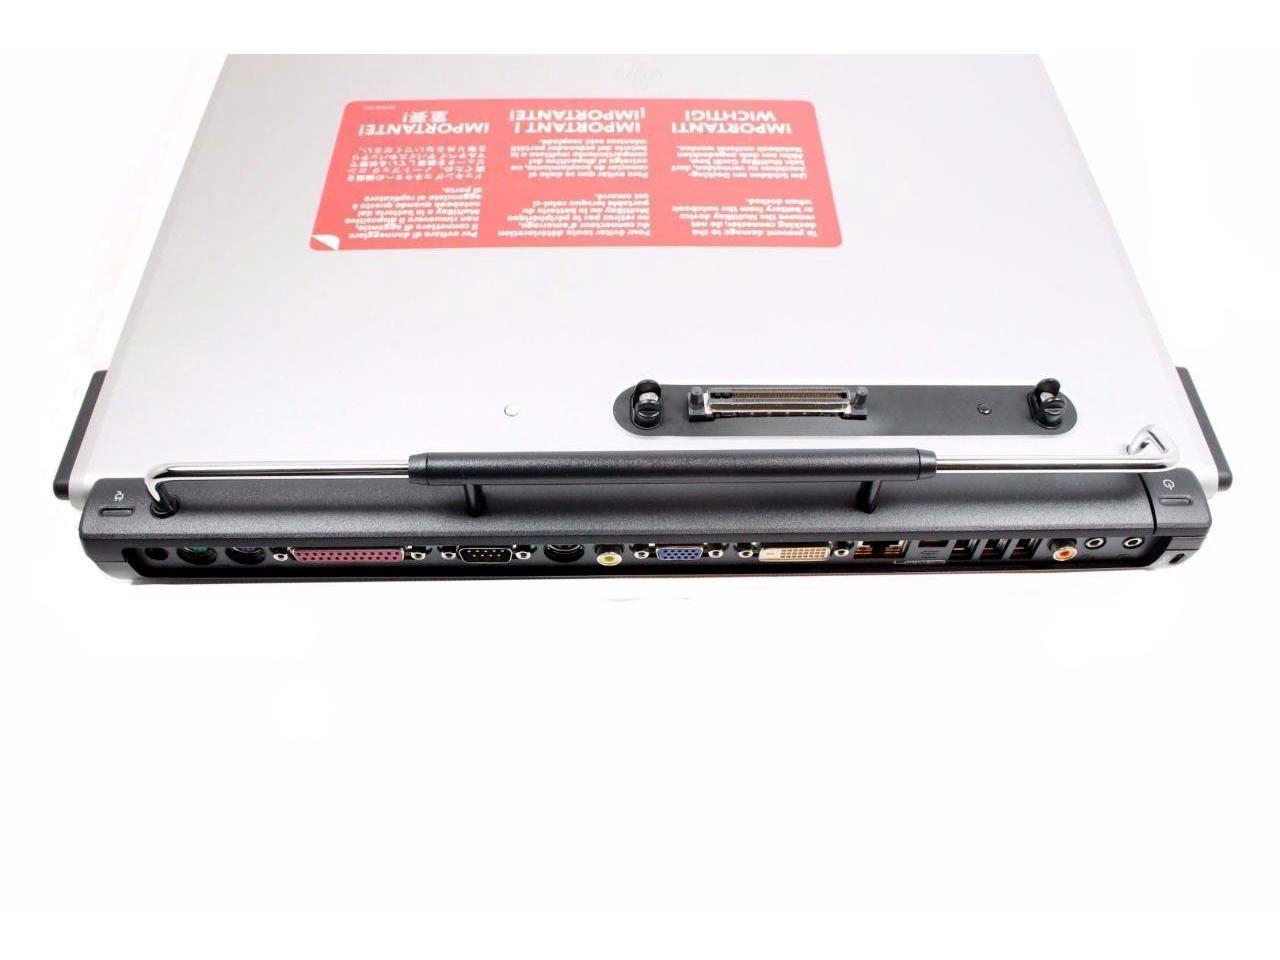 Amazon.com: HP PR1005 Compaq Presario 1000 Pavilion ZT3000 Workstation NW8000 USB External Docking Station Port Replicator 331740-001+N 331740-001-B: ...